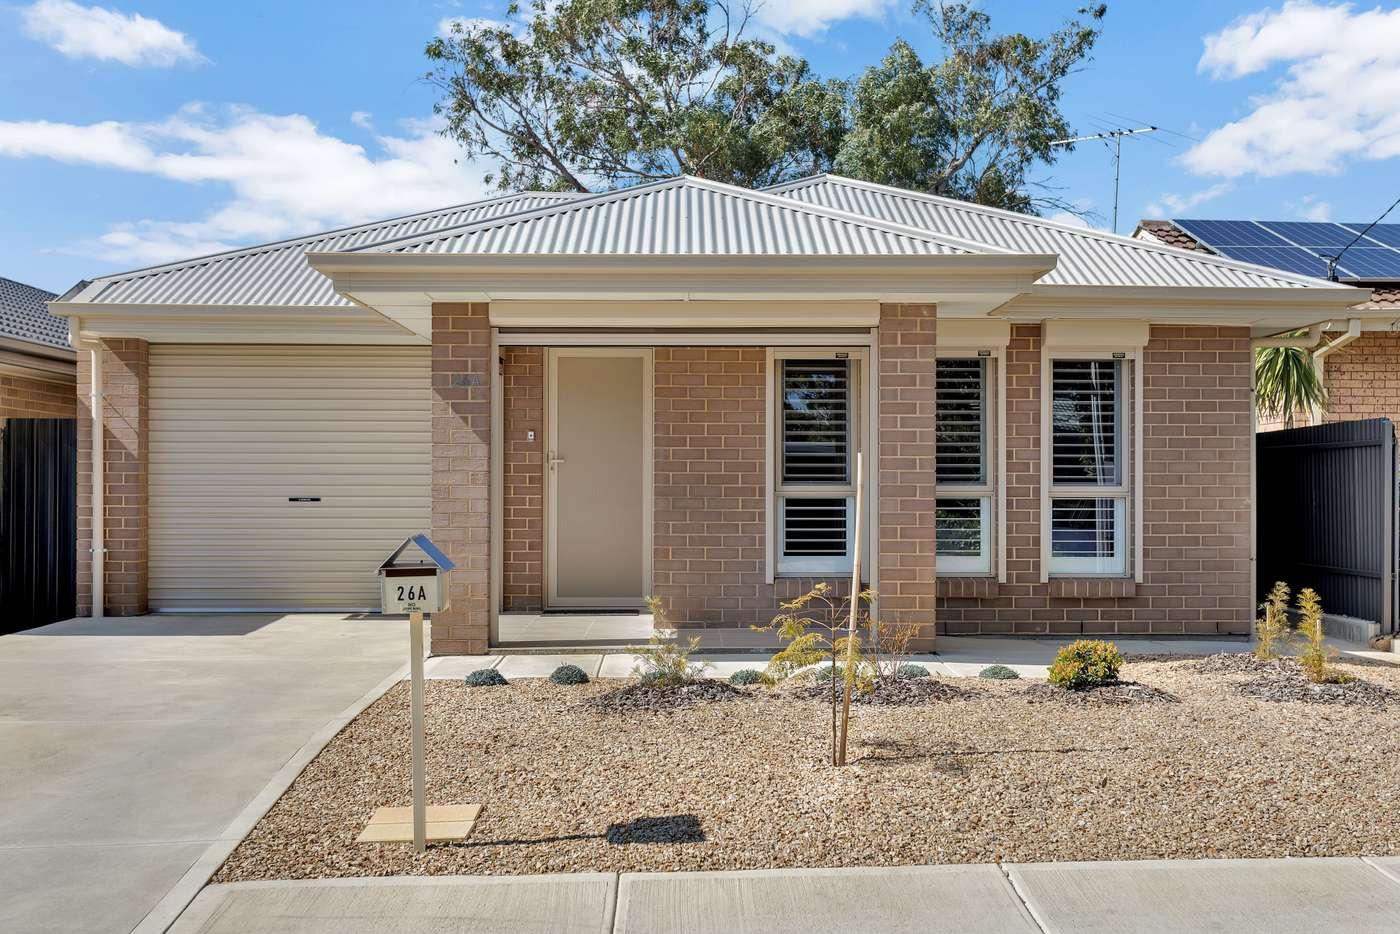 Main view of Homely house listing, 26a Freeman Avenue, Morphett Vale SA 5162